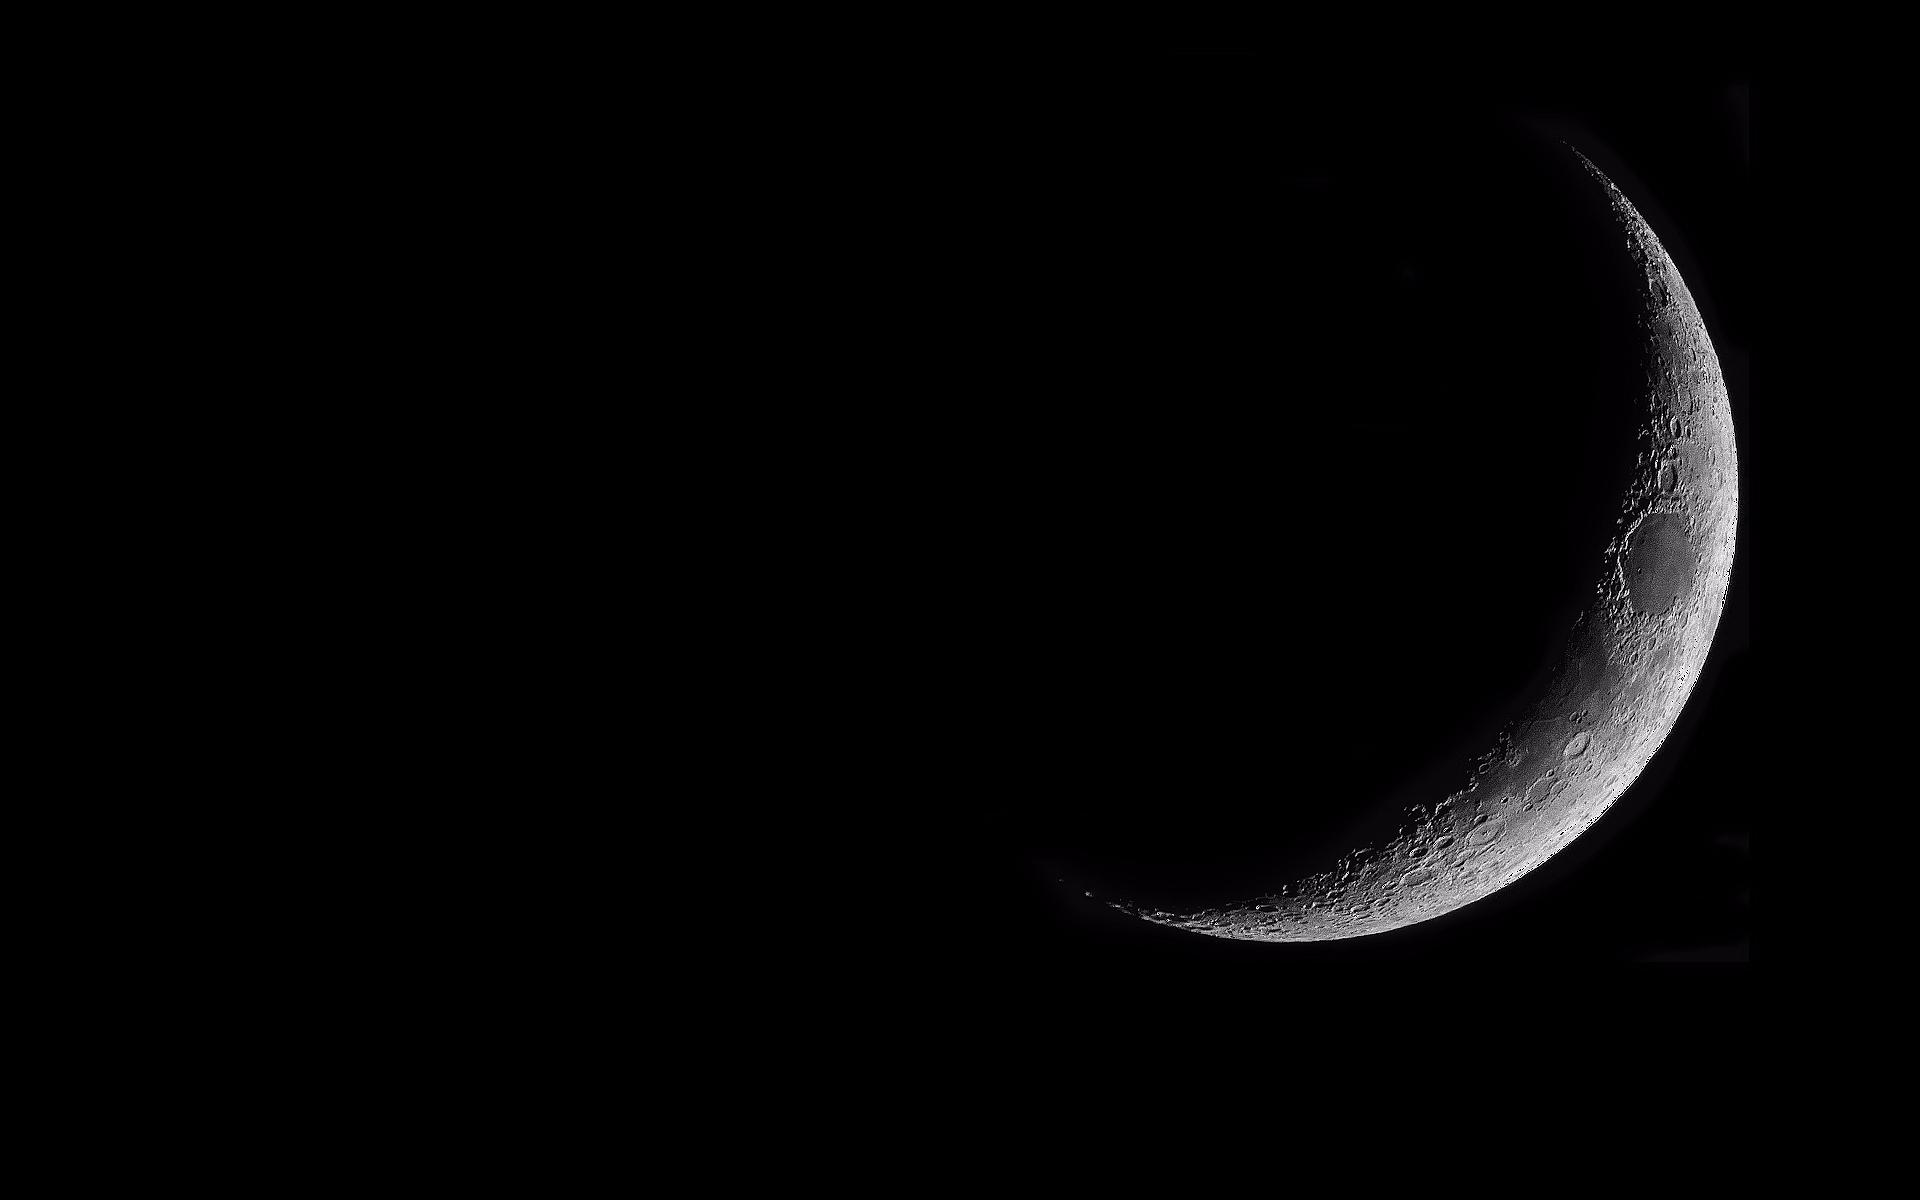 Crescent Moon Wallpaper 1920 X 1200.jpg